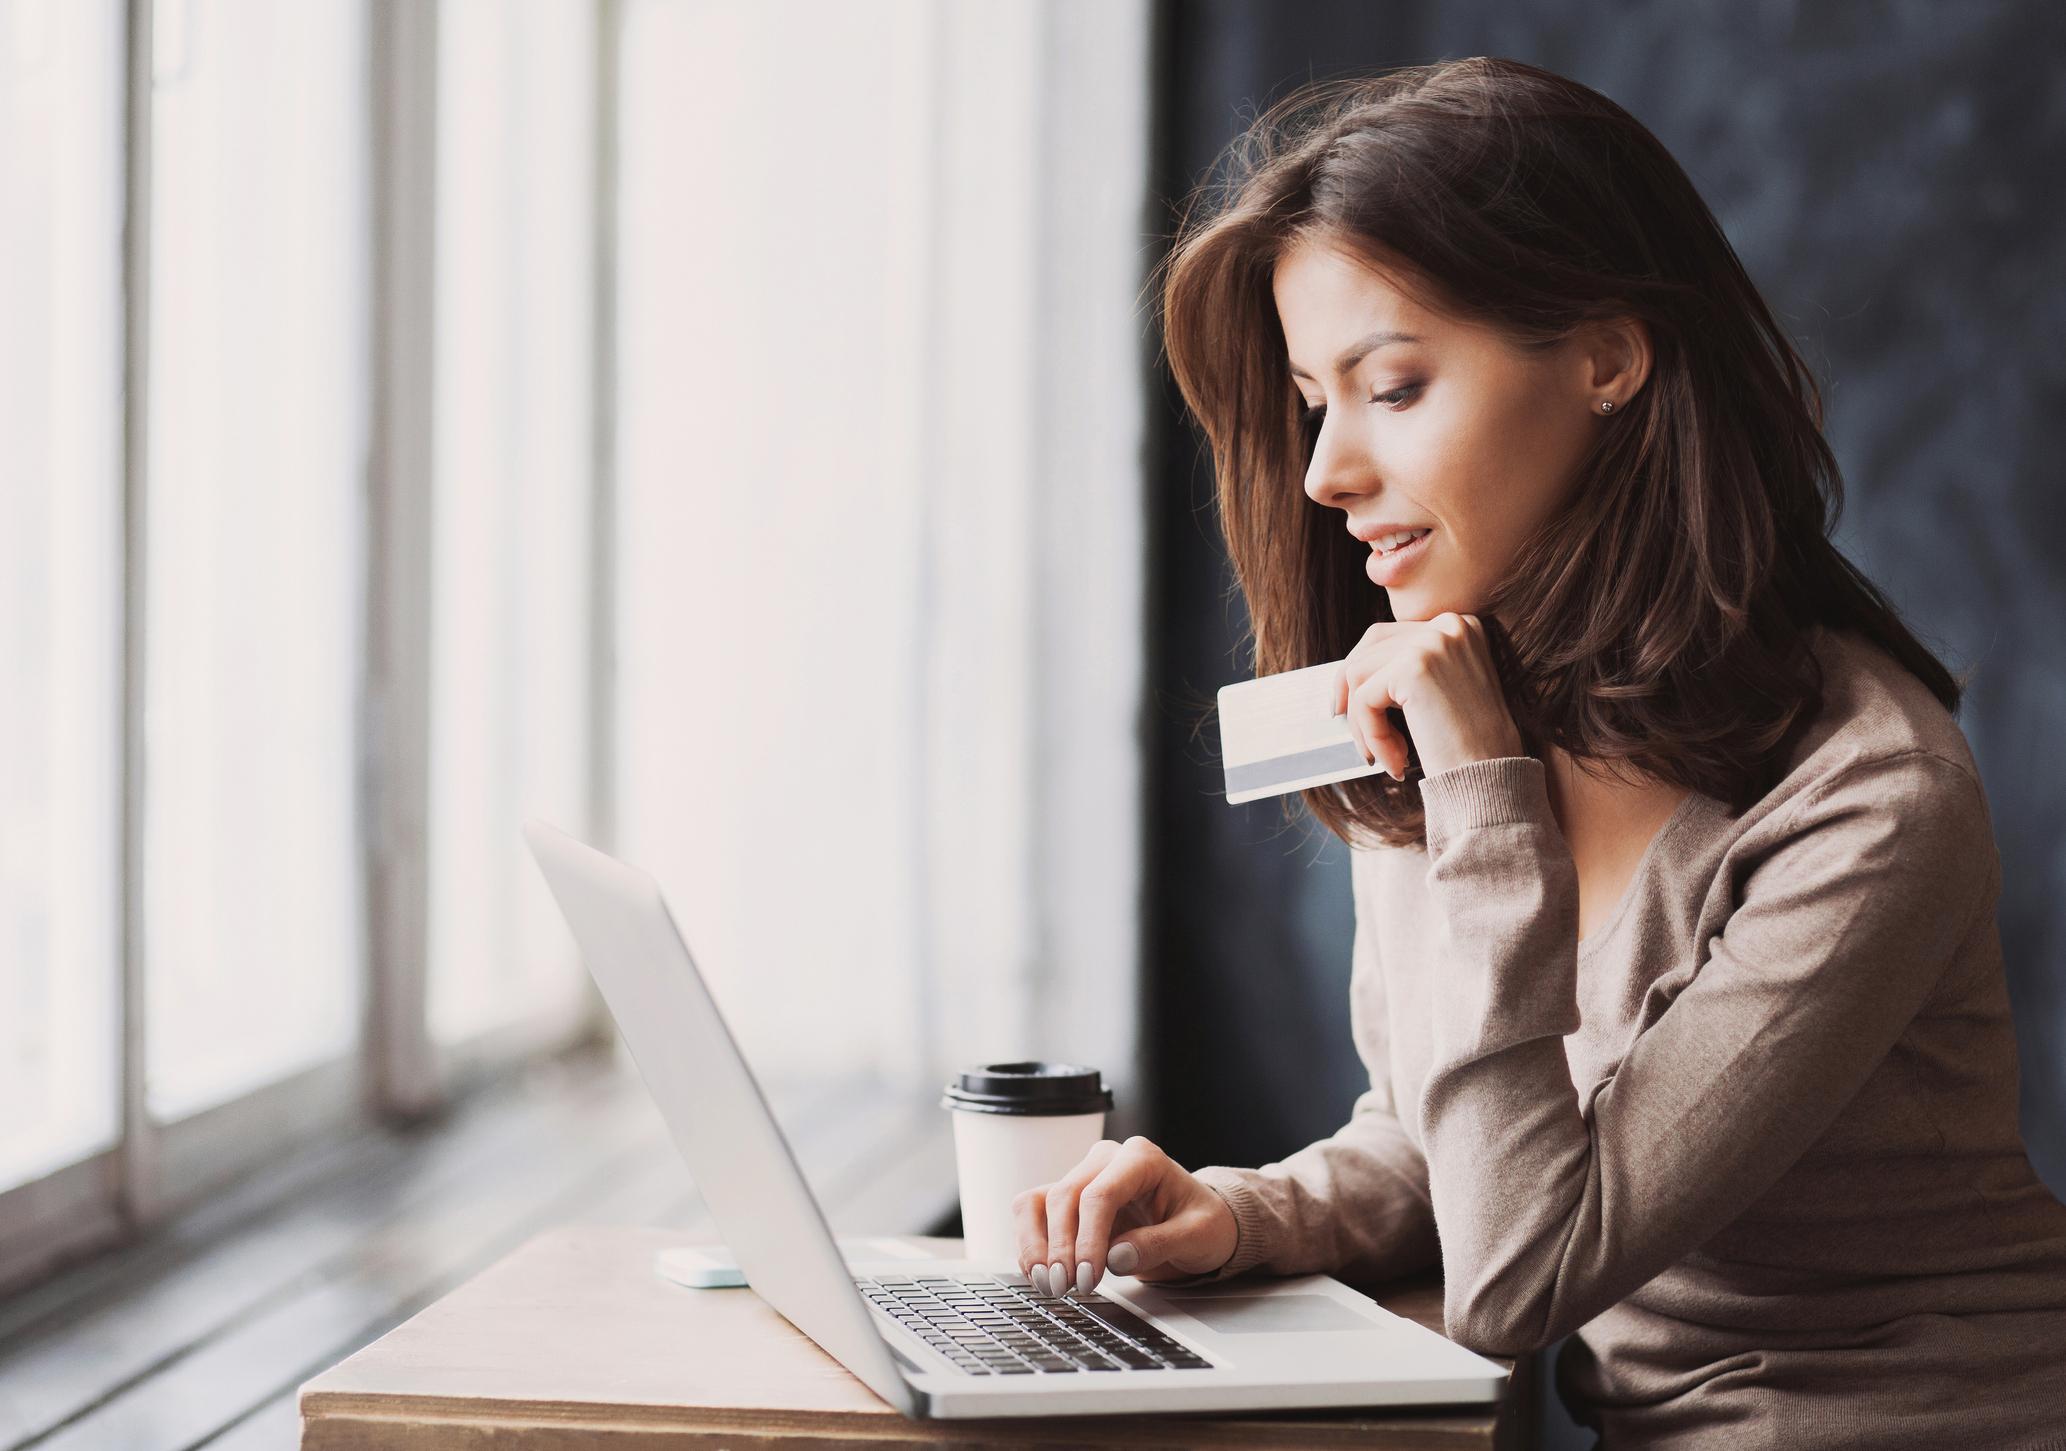 Woman shopping on laptop.